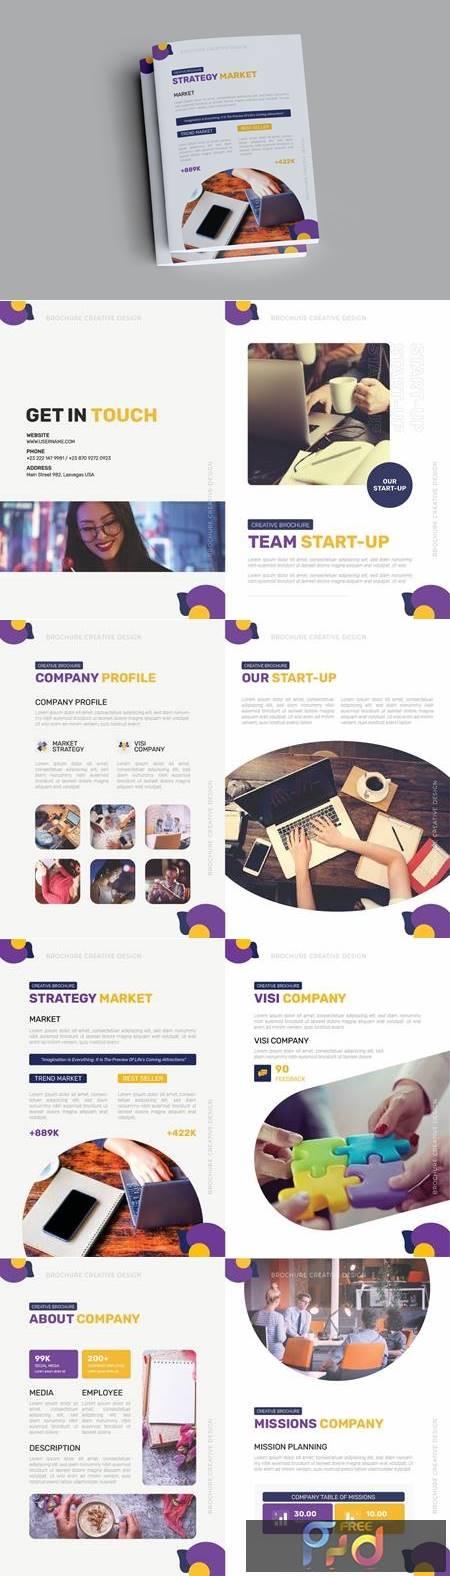 Team Start-Up Brochure CHJBPMY 1